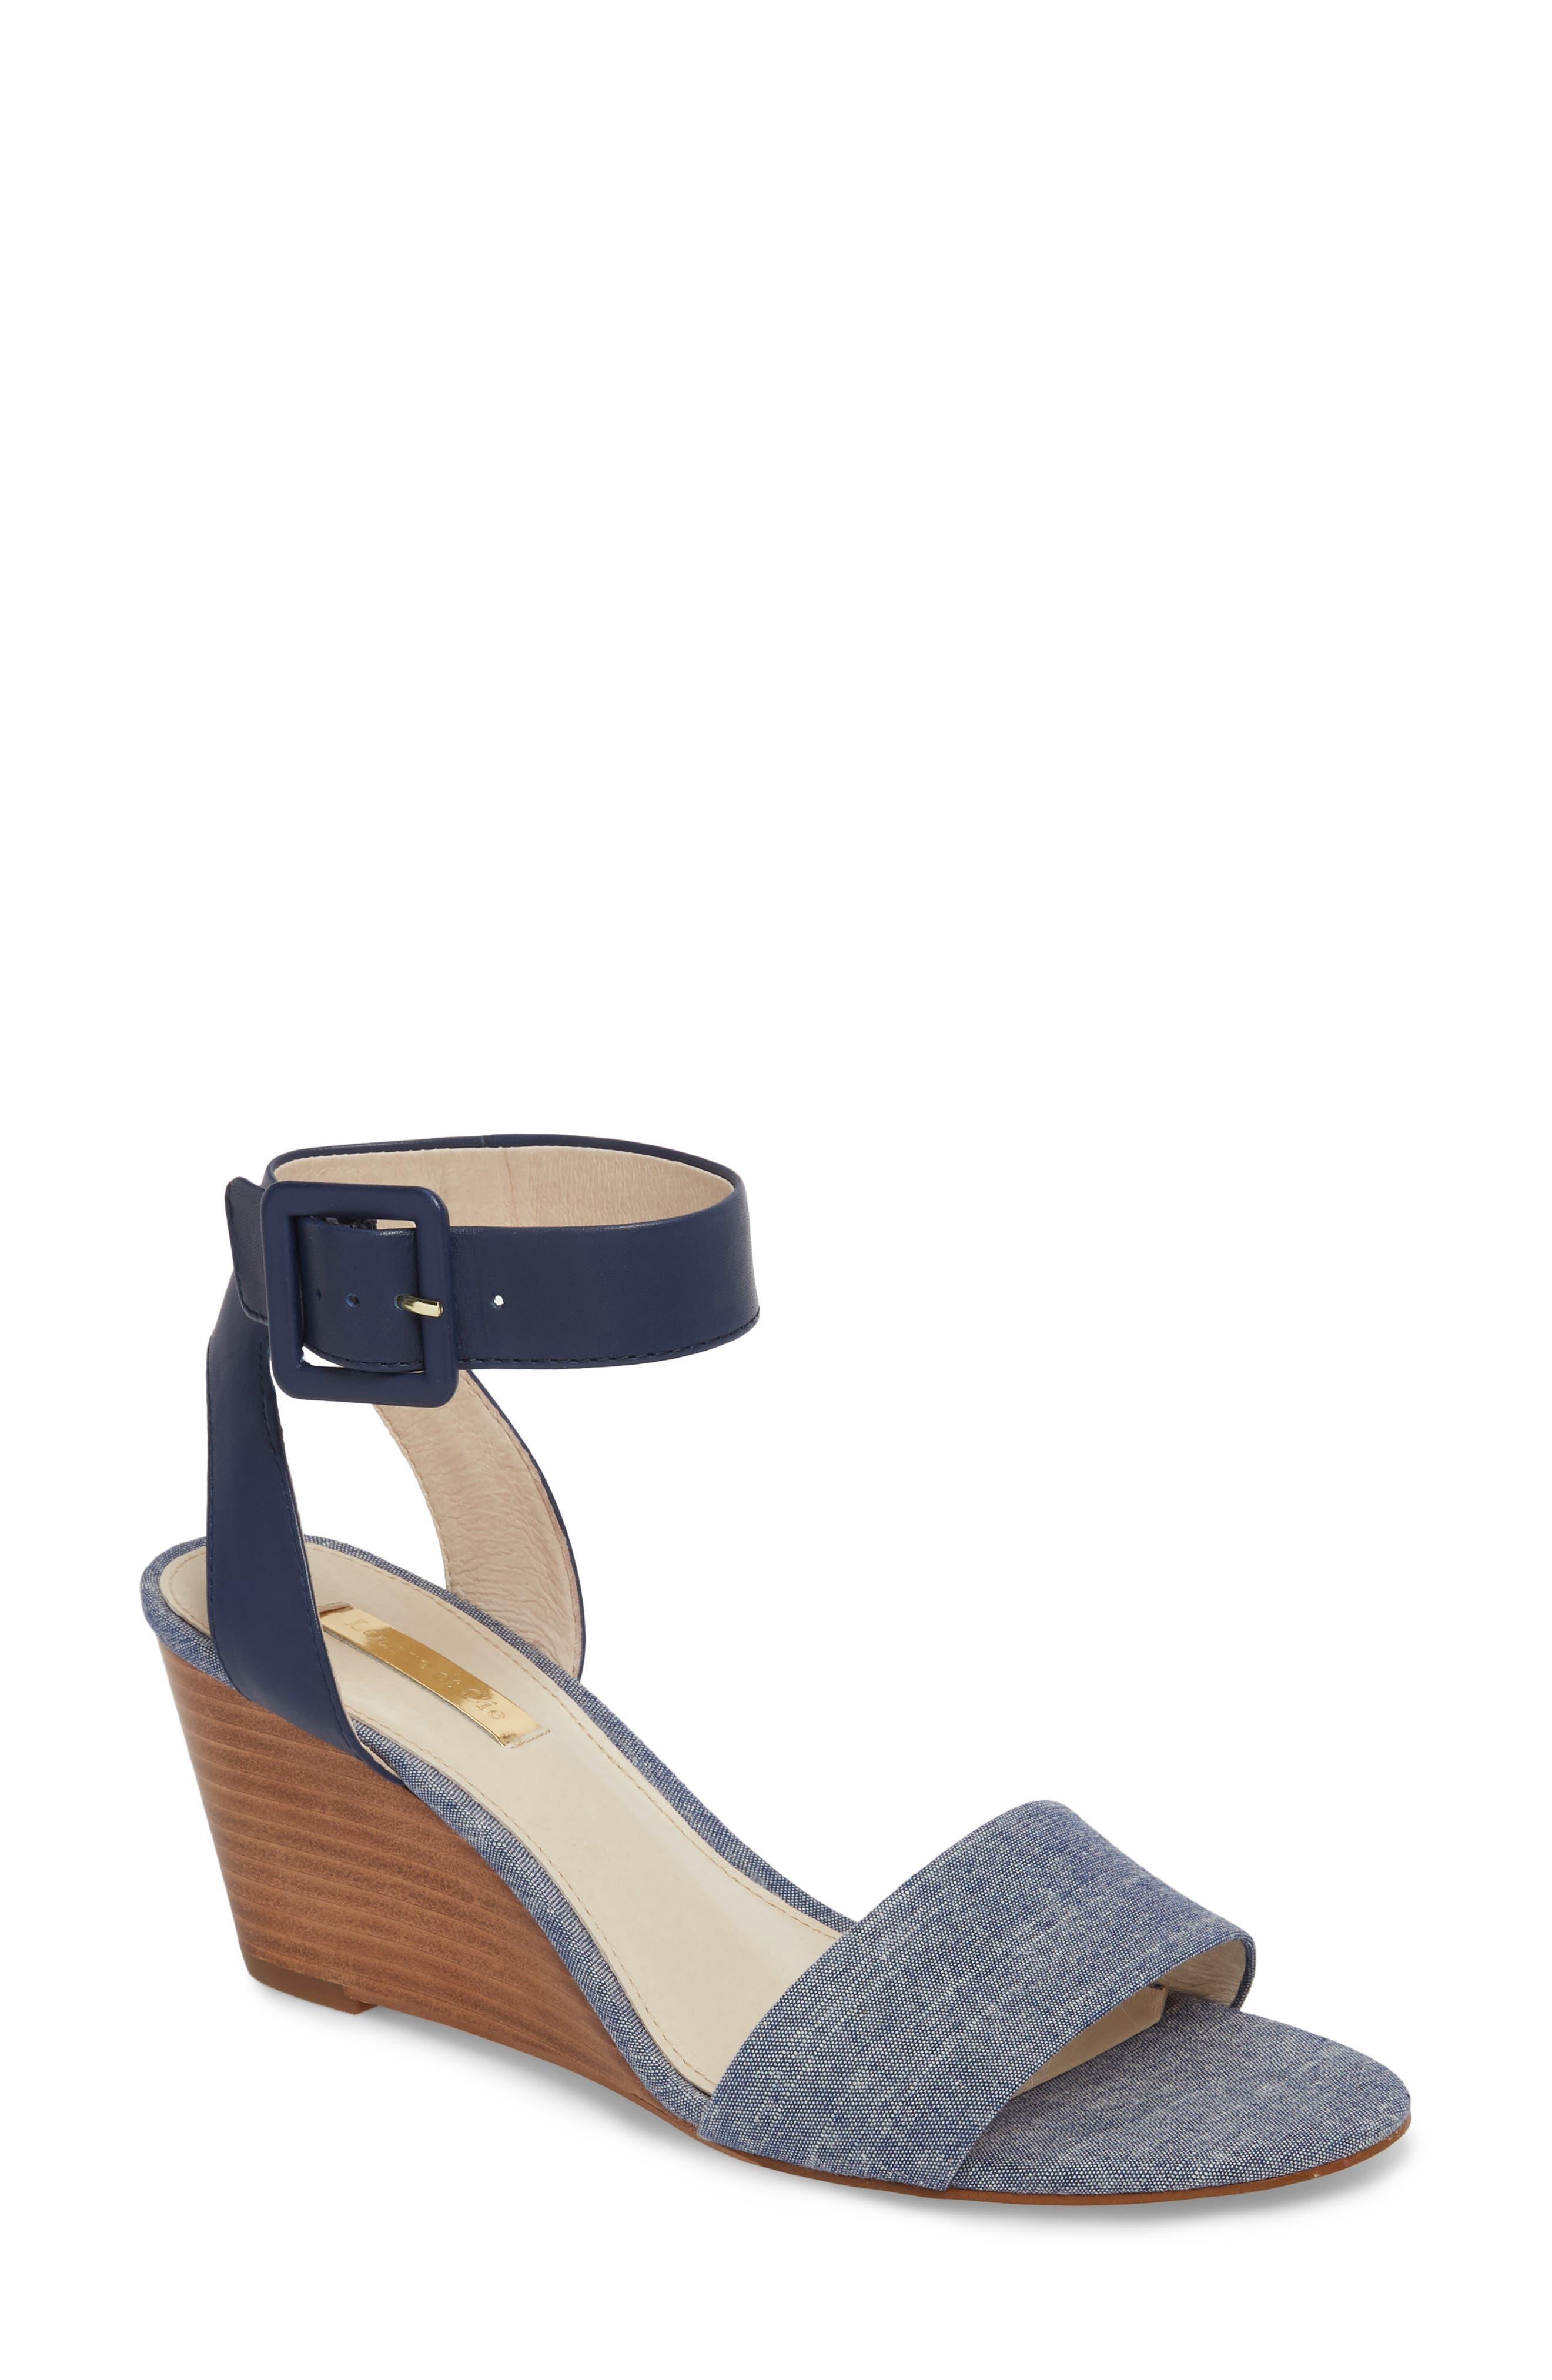 Louise et Cie Punya Wedge Sandal (Women)